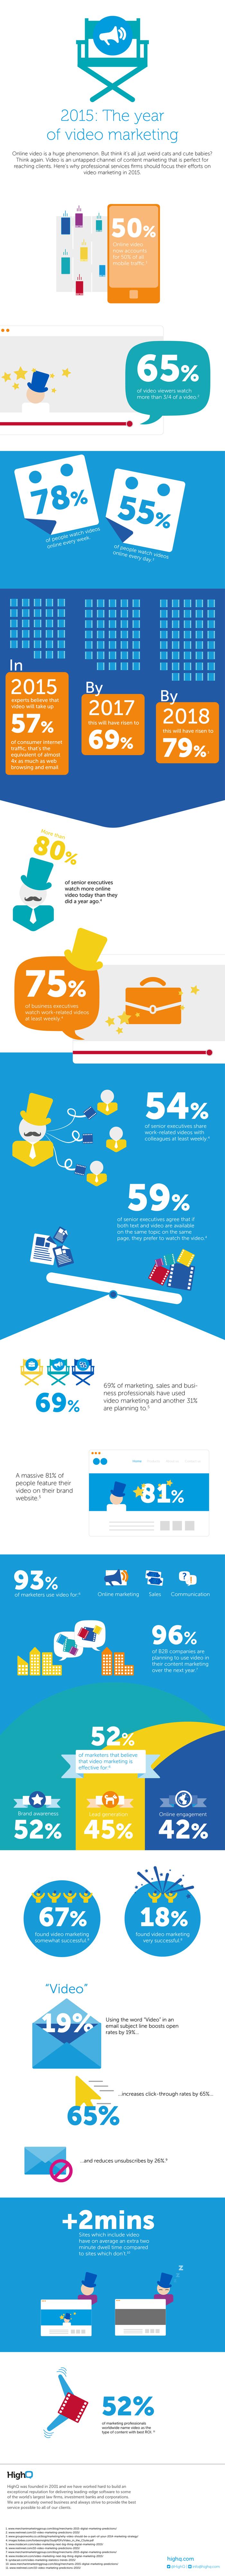 video marketing 2015 (1)-700